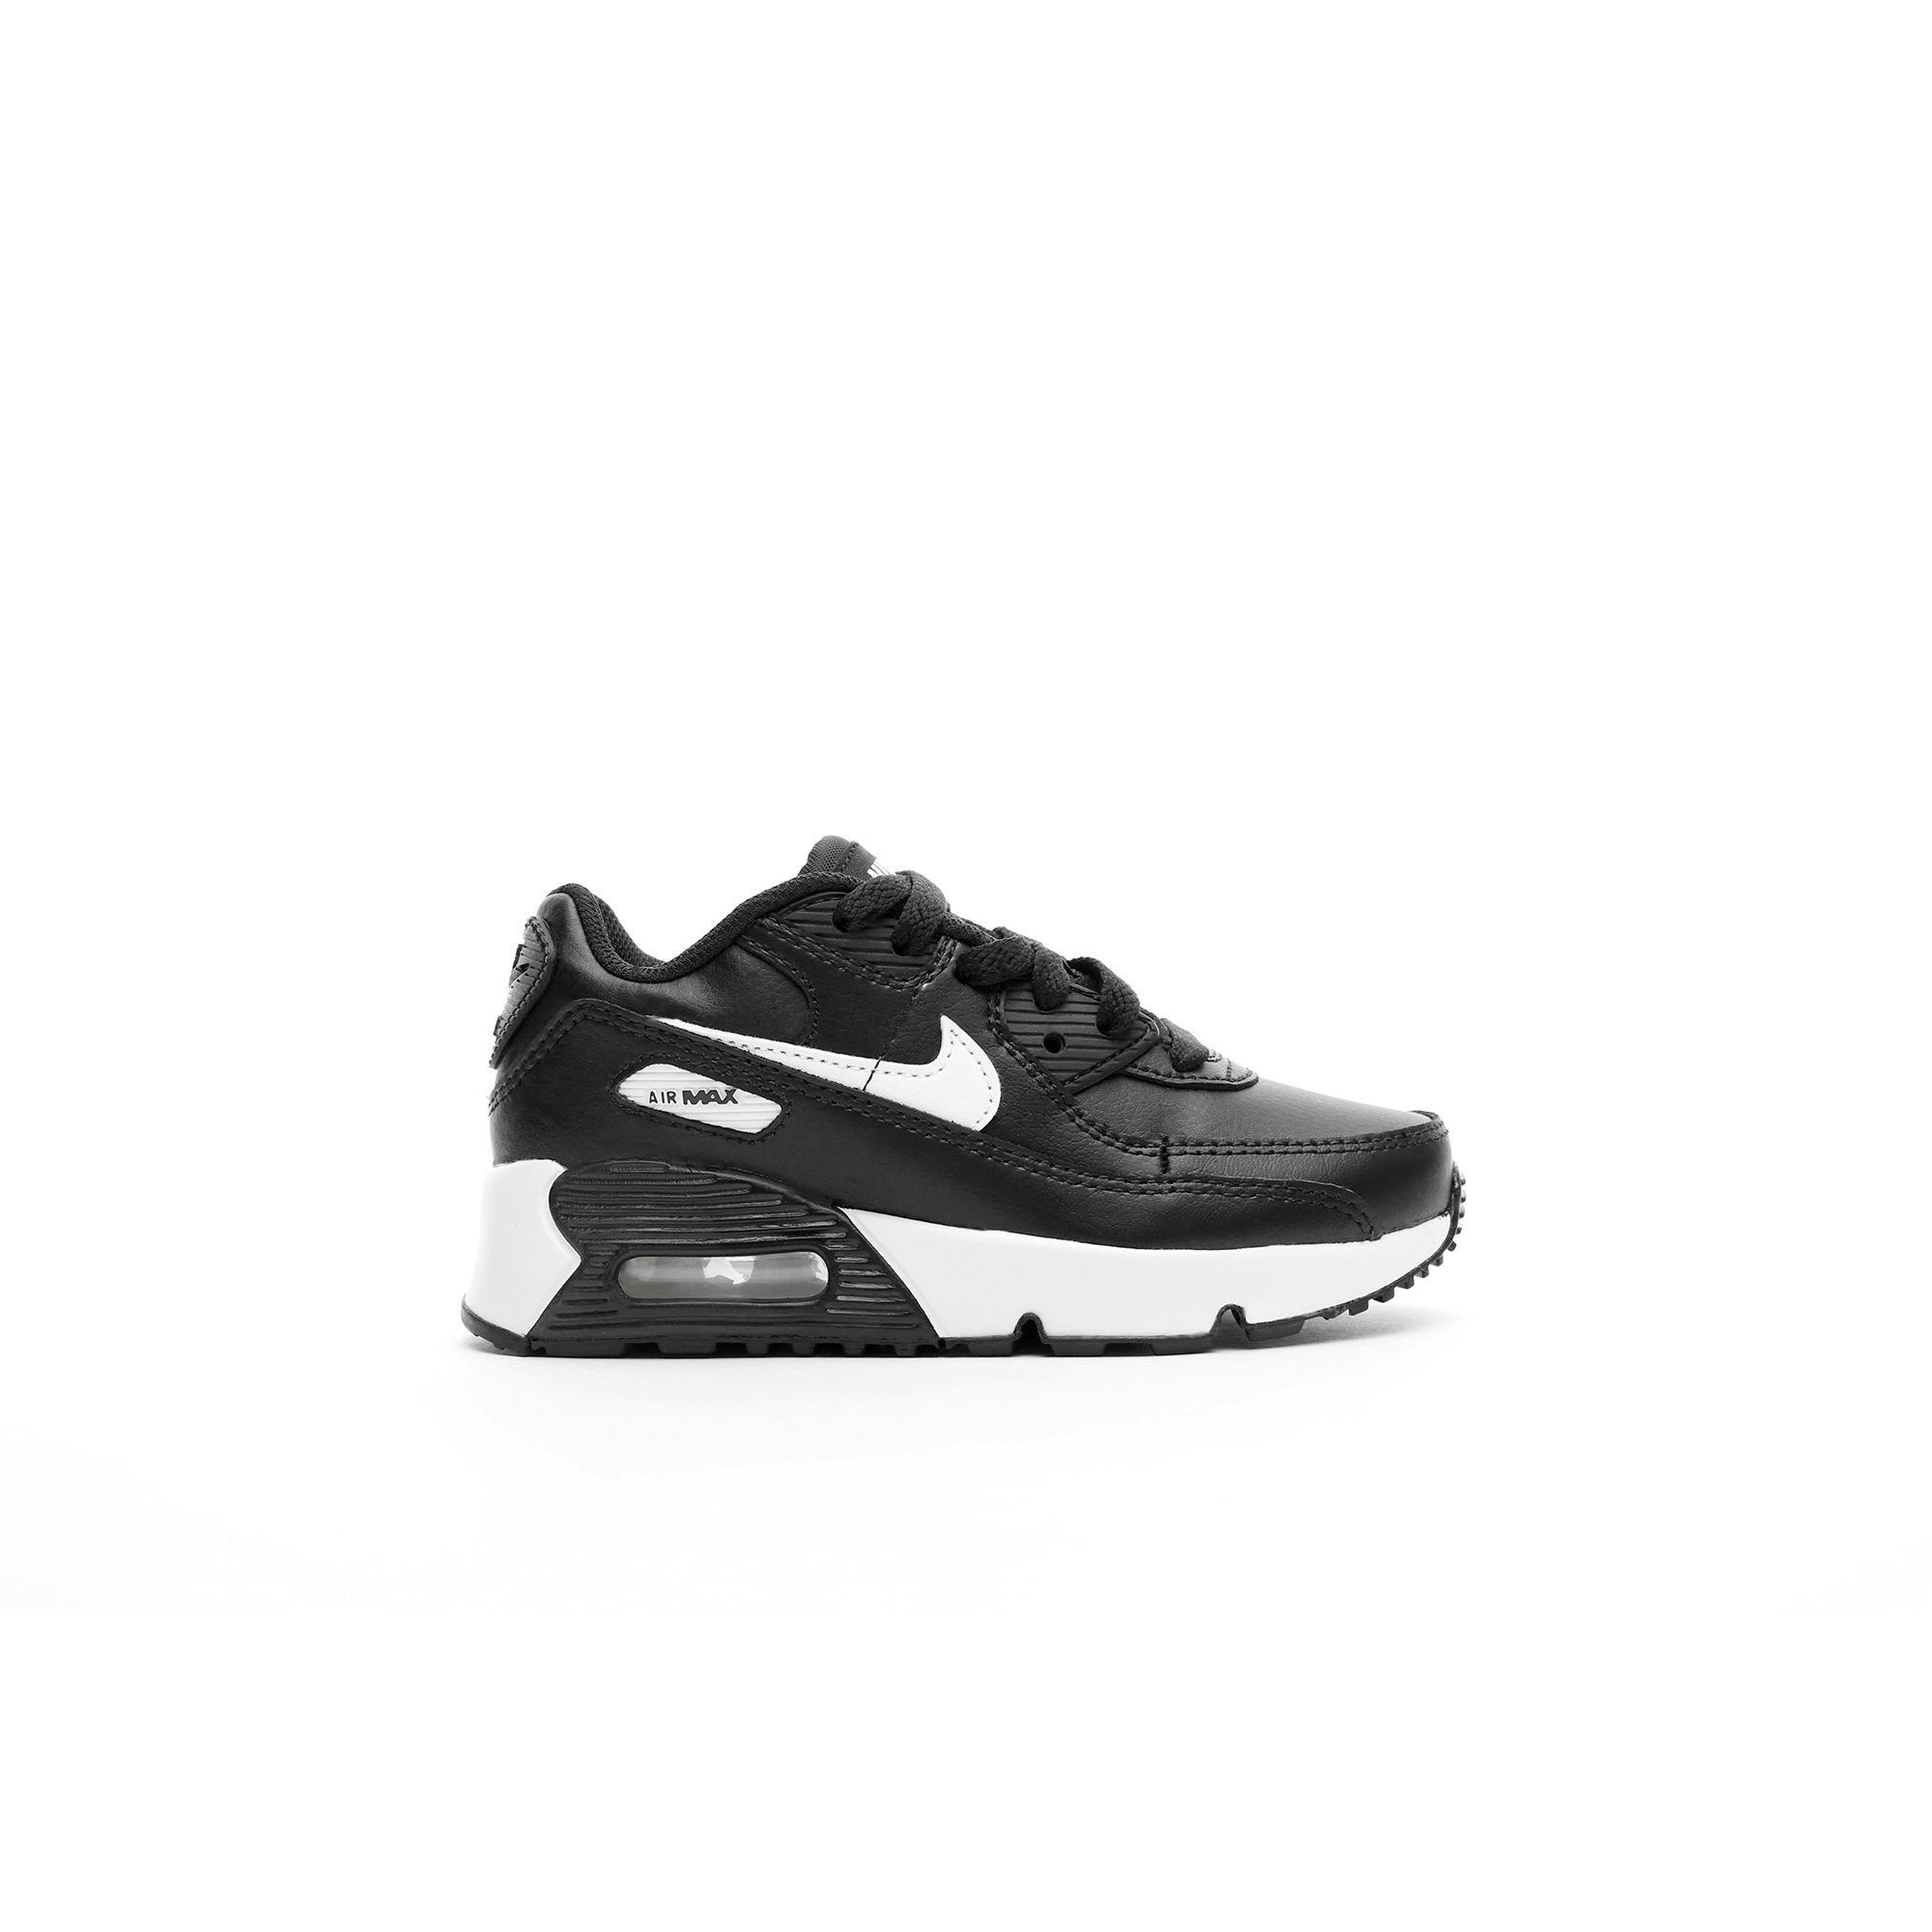 Nike Air Max 90 LTR Çocuk Siyah Spor Ayakkabı